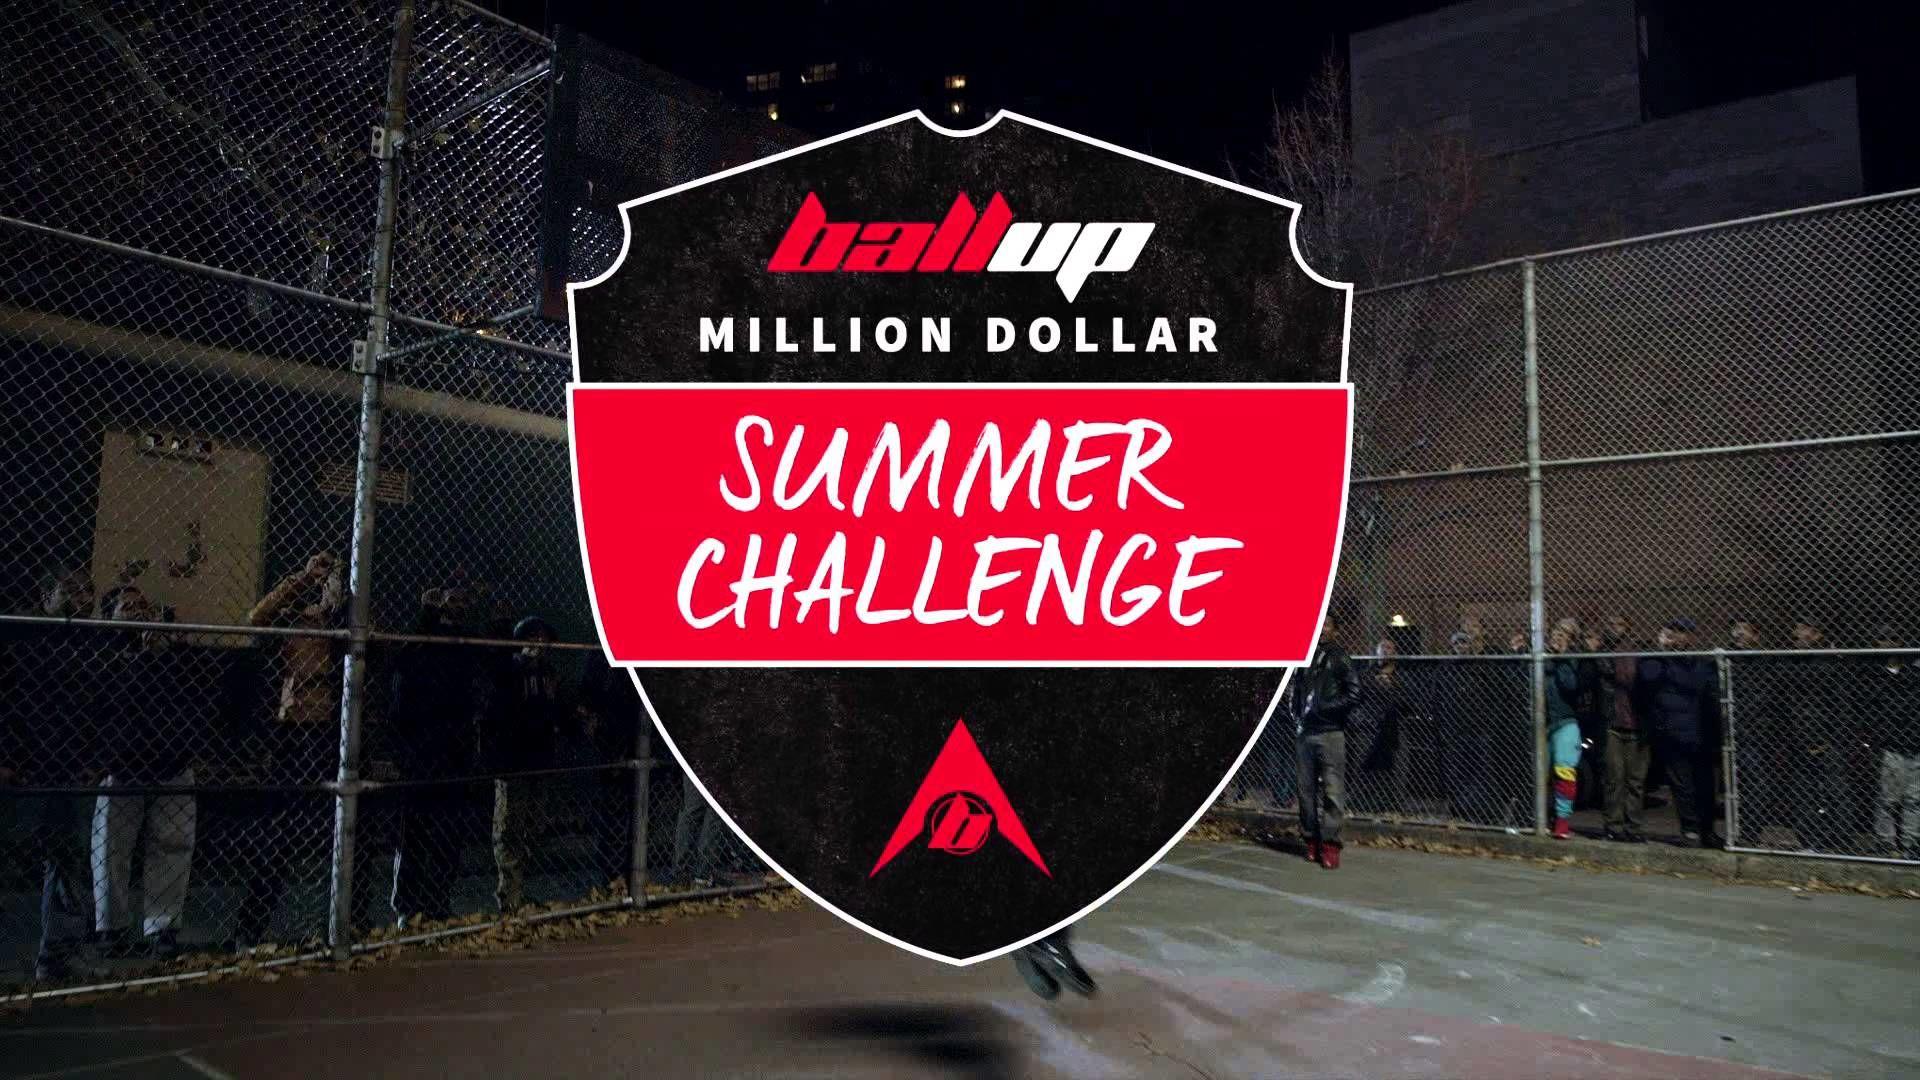 Ball Up Million Dollar Summer Challenge ne zaman